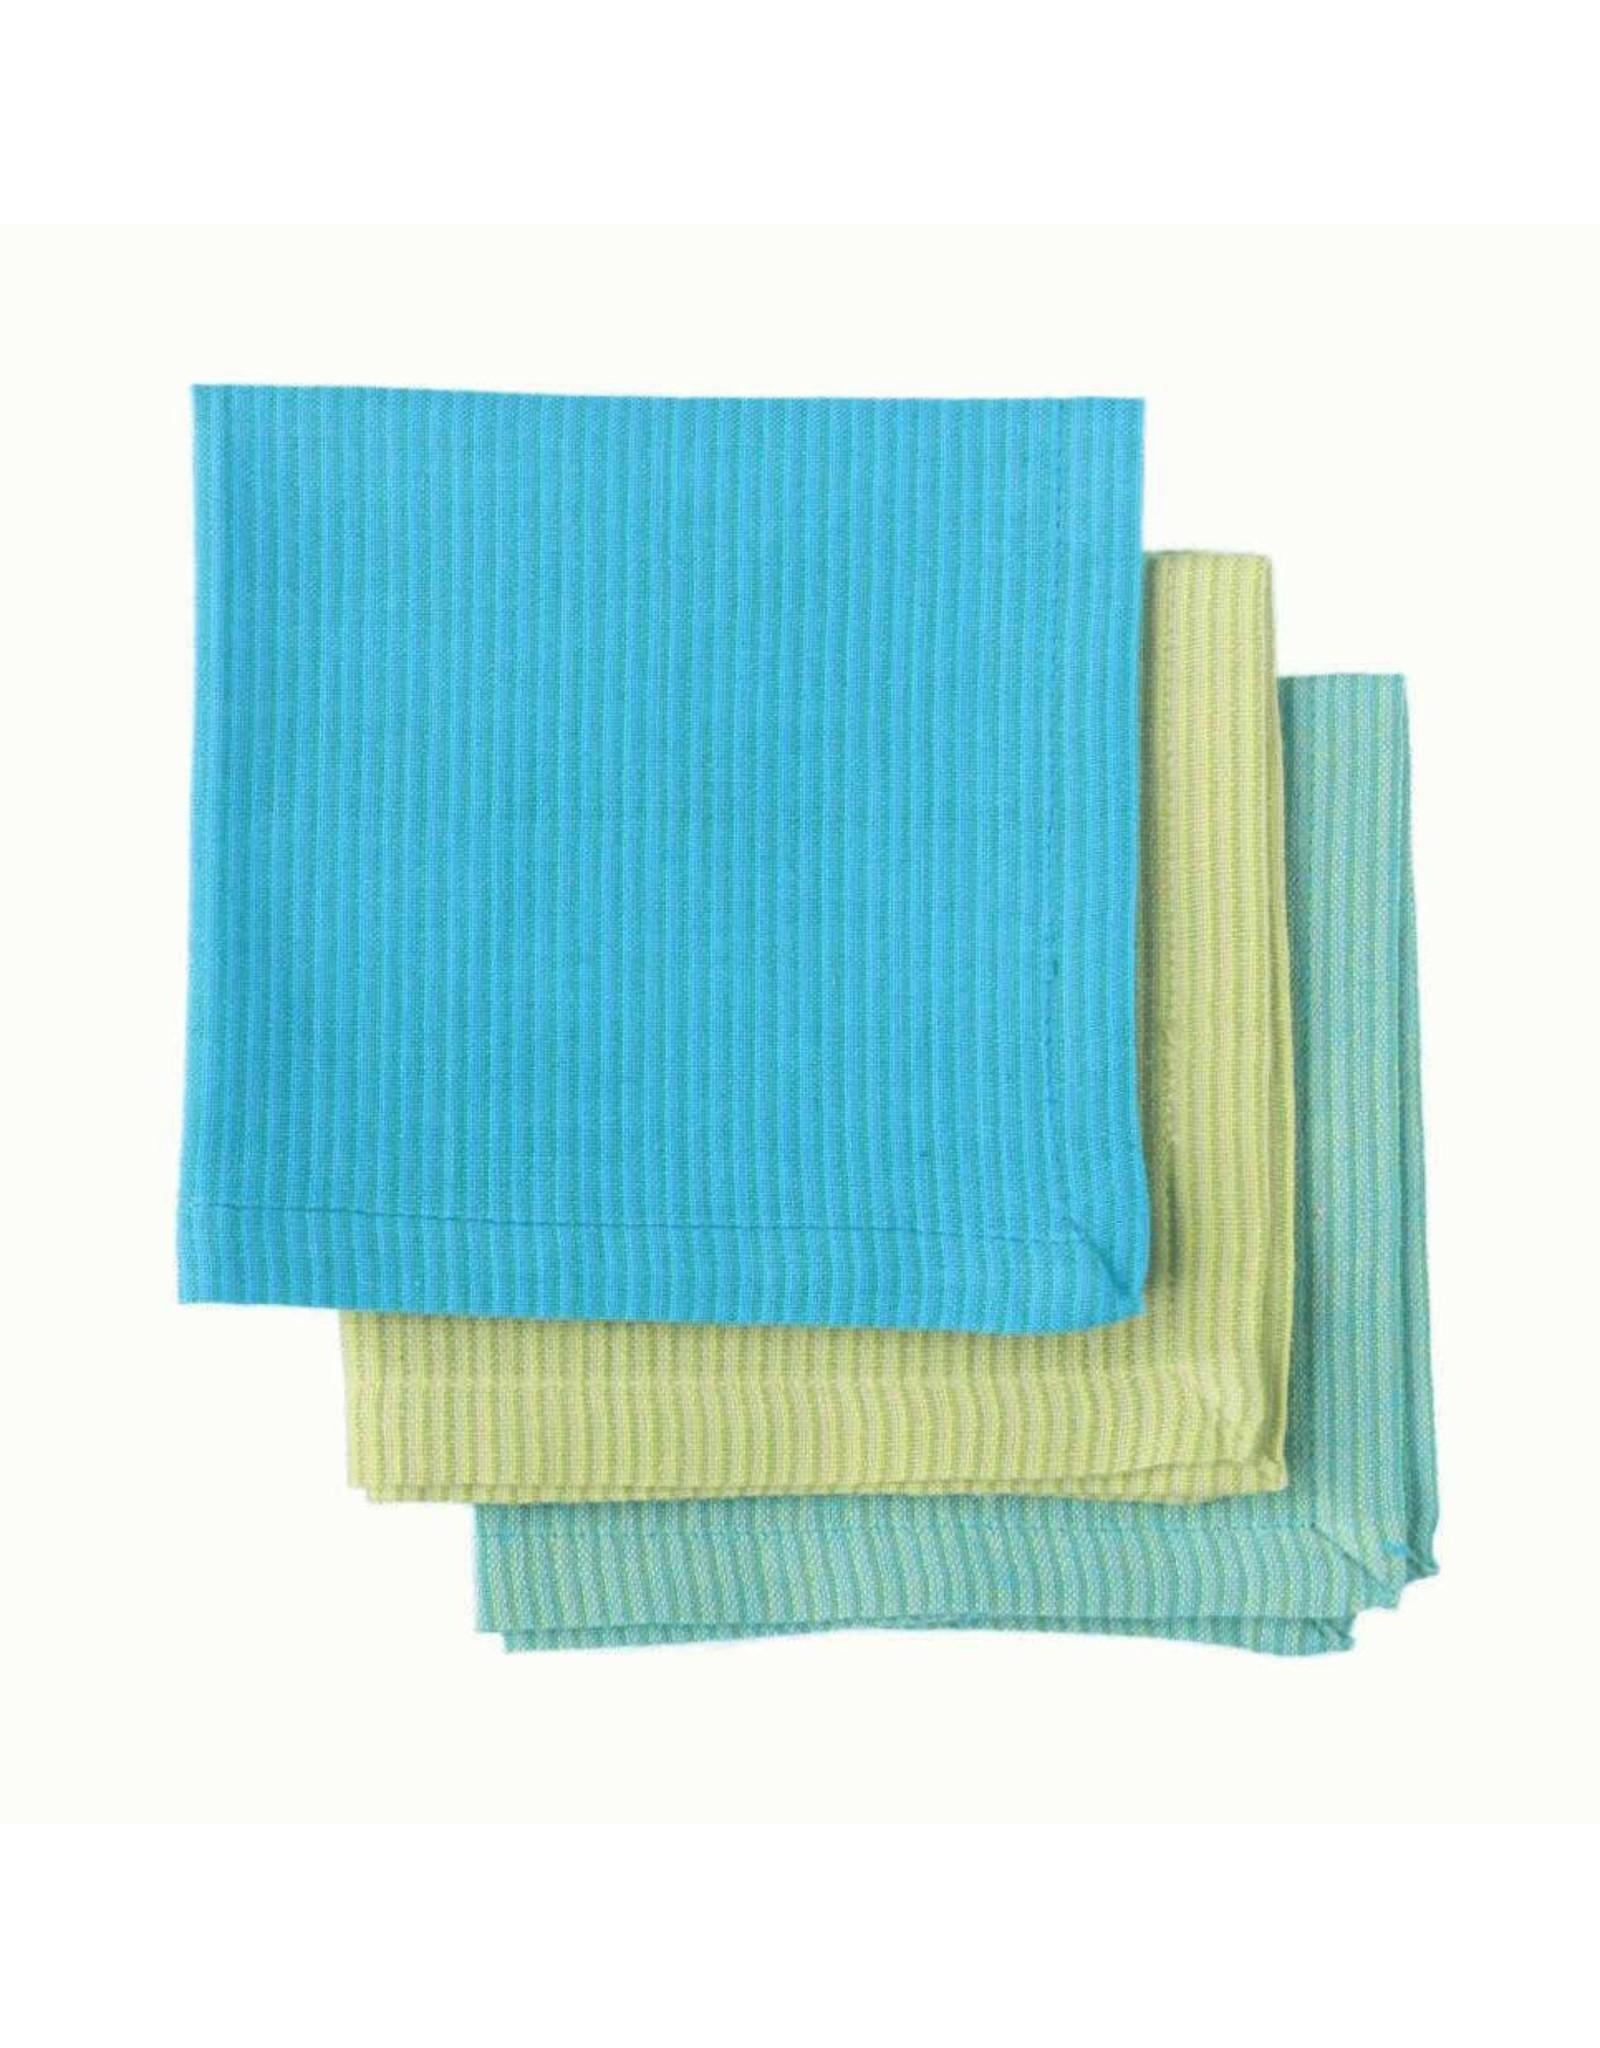 India, 9 x 9 Cotton Handkerchief Cambridge